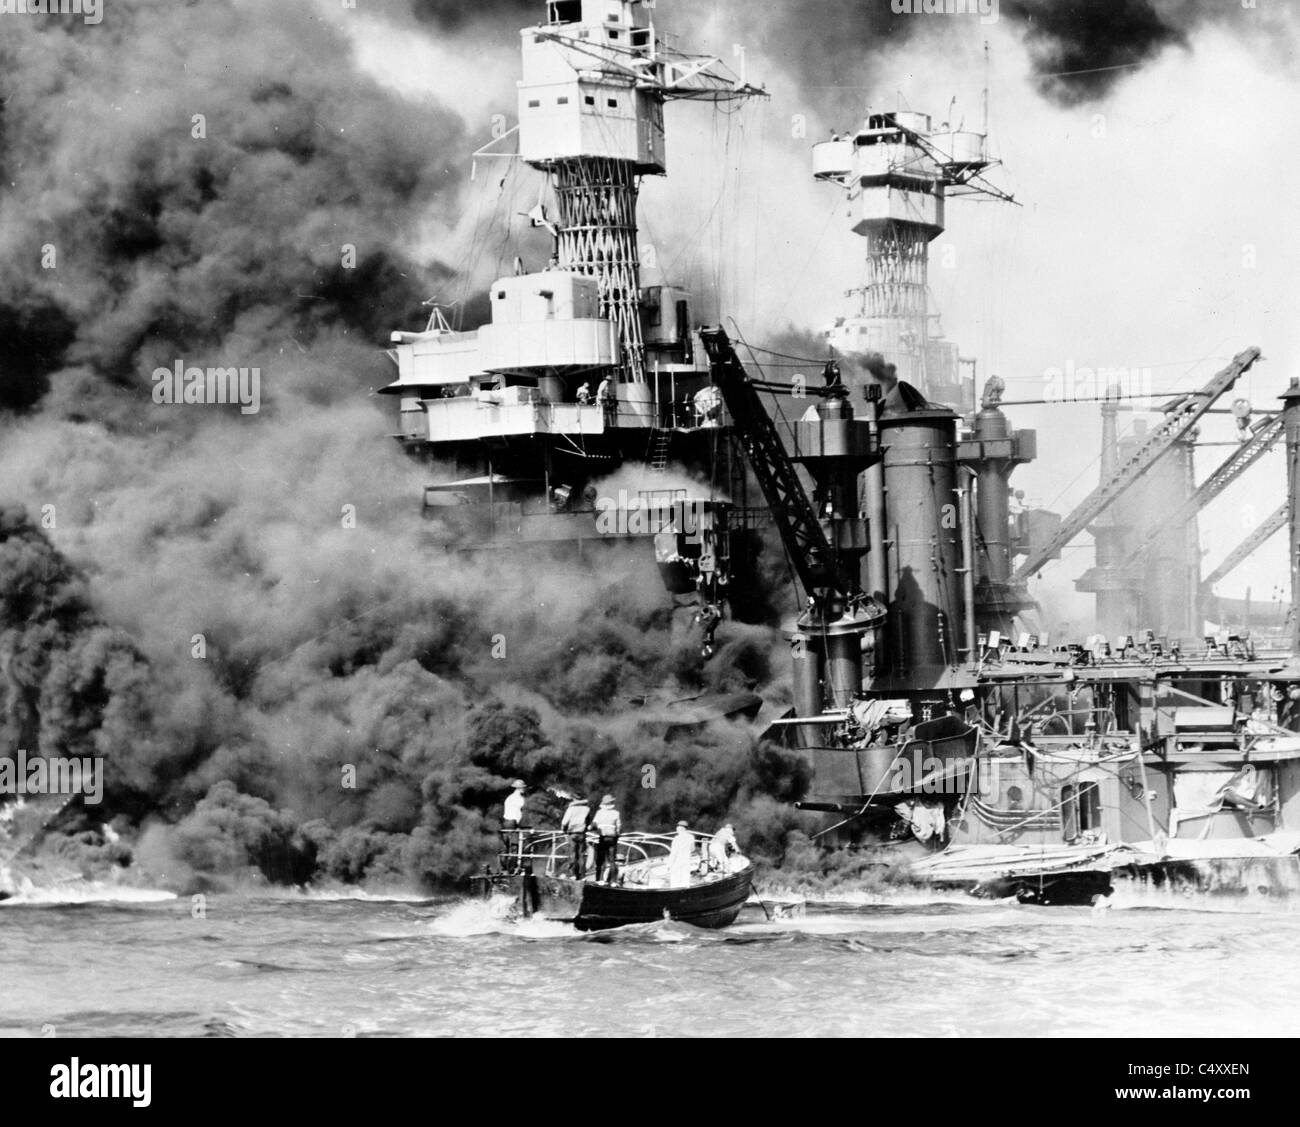 USS West Virginia brennen nach dem Angriff auf Pearl Harbor, Hawaii. Stockbild